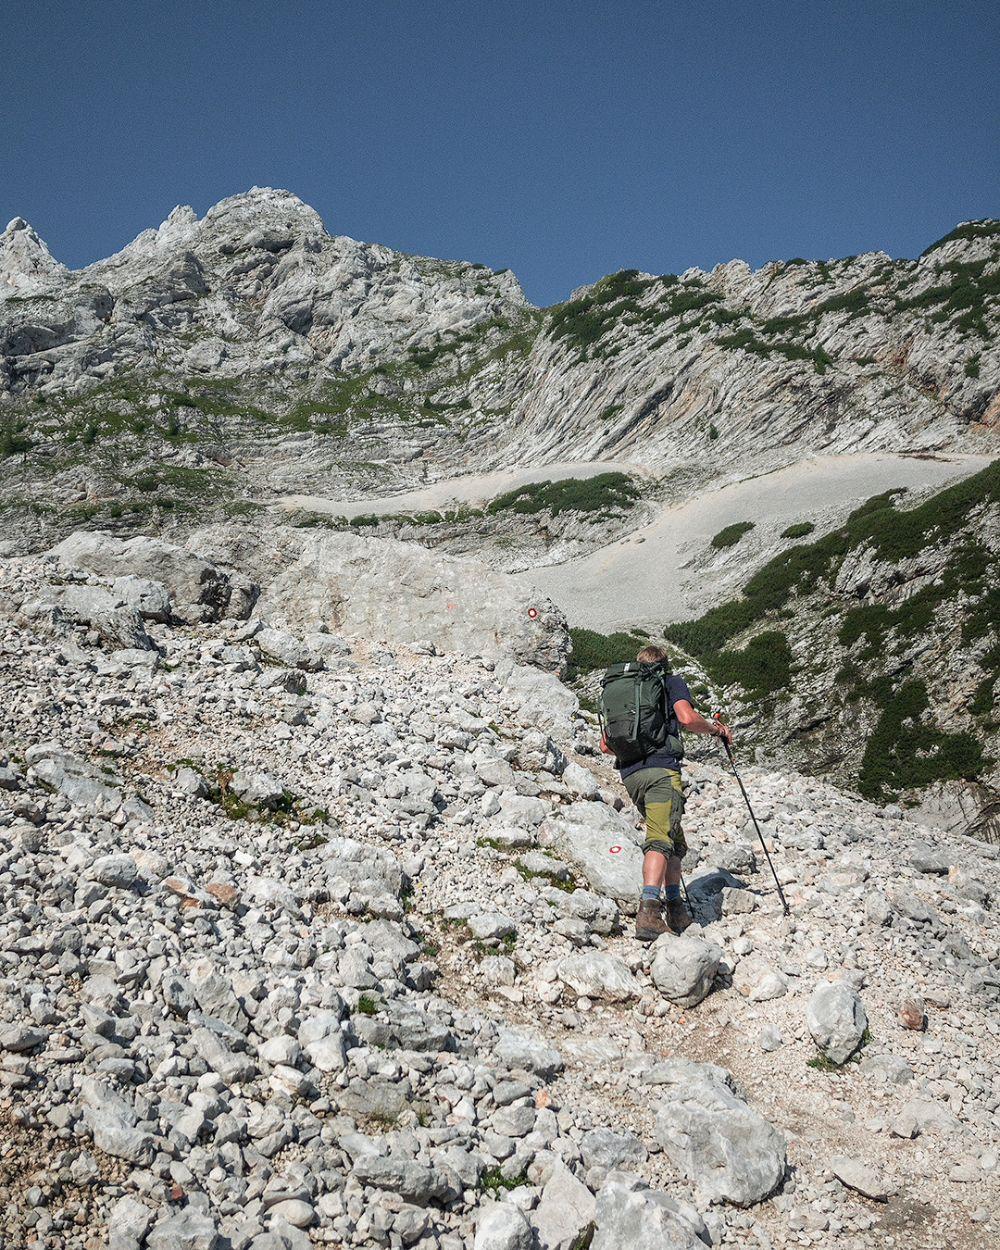 Dutchies Outside - Hiken over Puinhellingen - bergwandeltechnieken